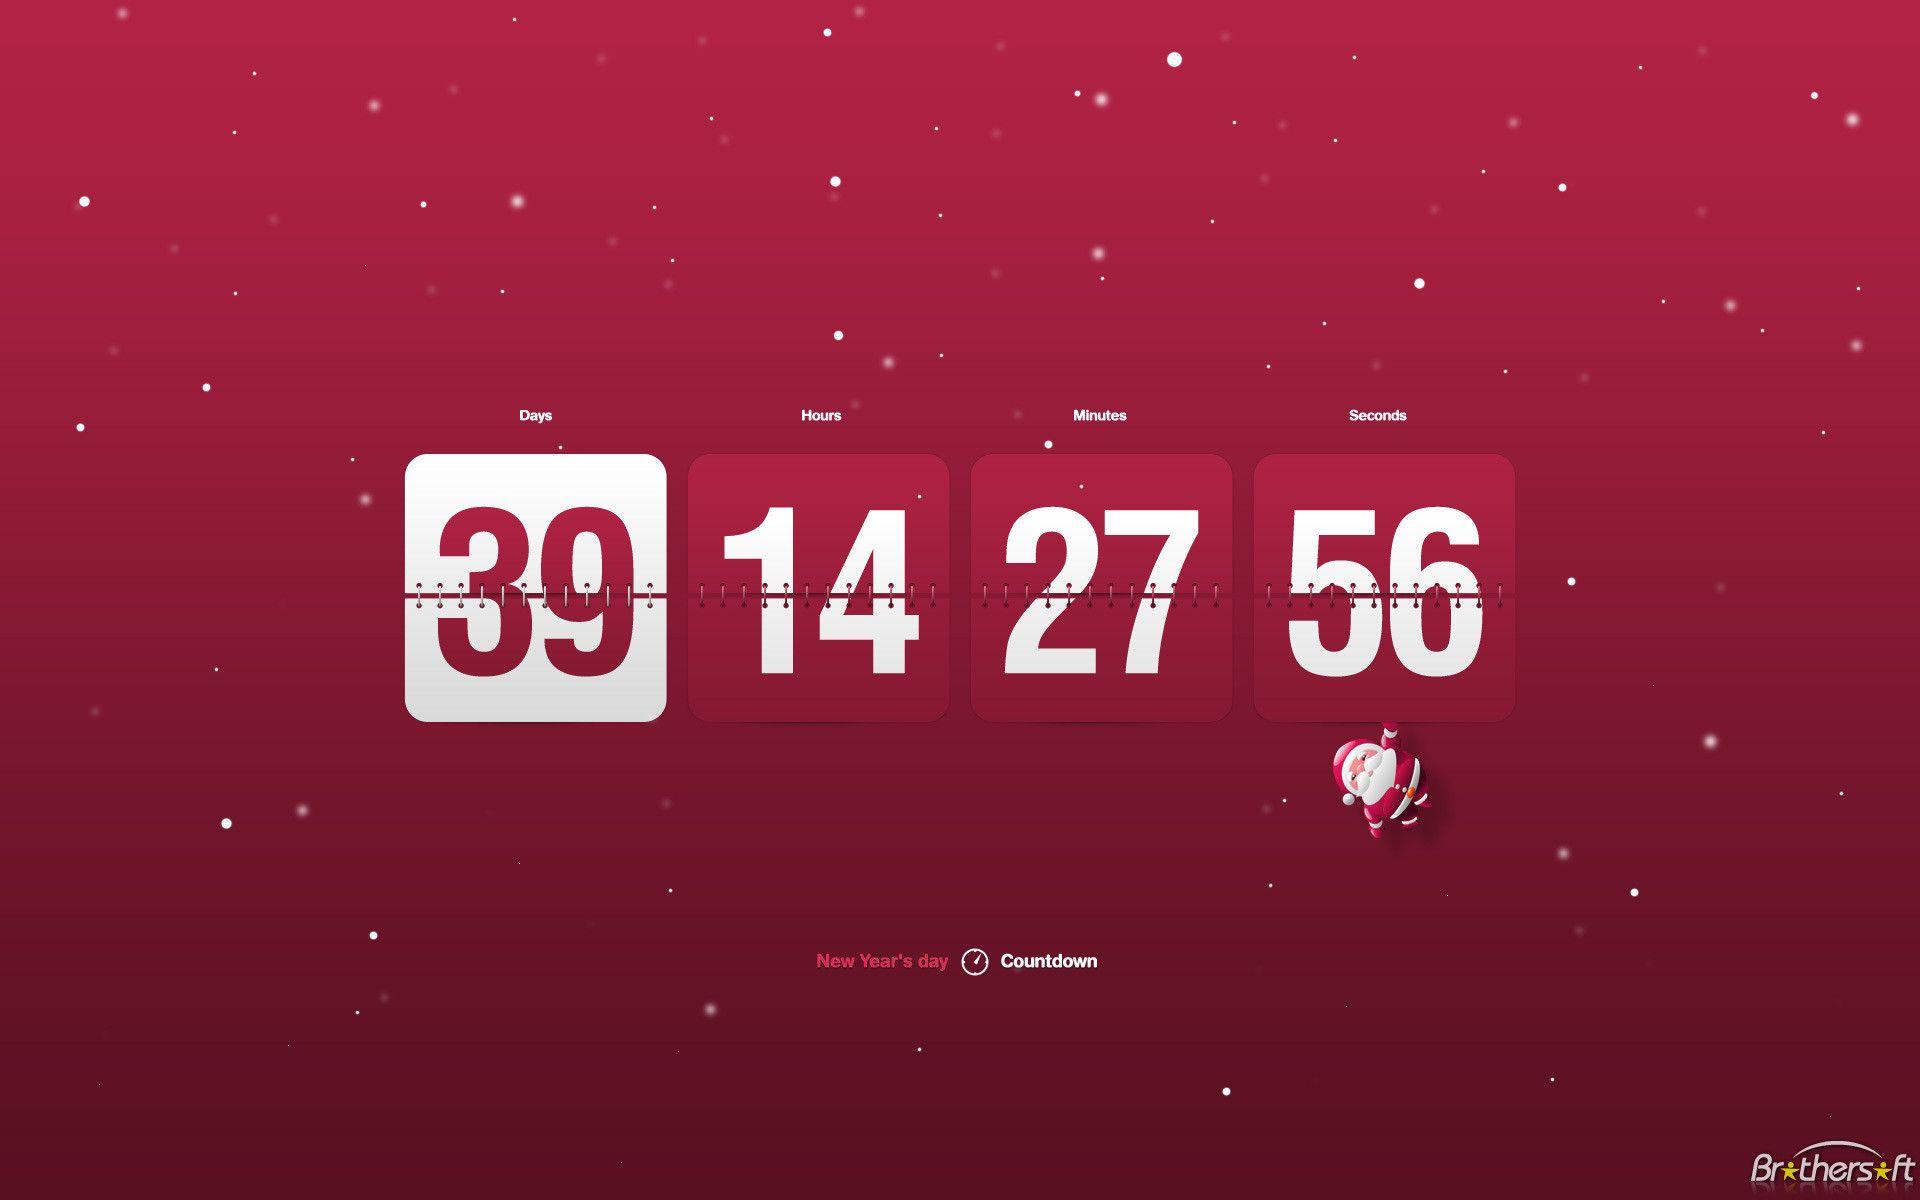 Clock Live Wallpaper Windows 10 57 Images Countdown Calendar Retirement Countdown Clock Screensaver